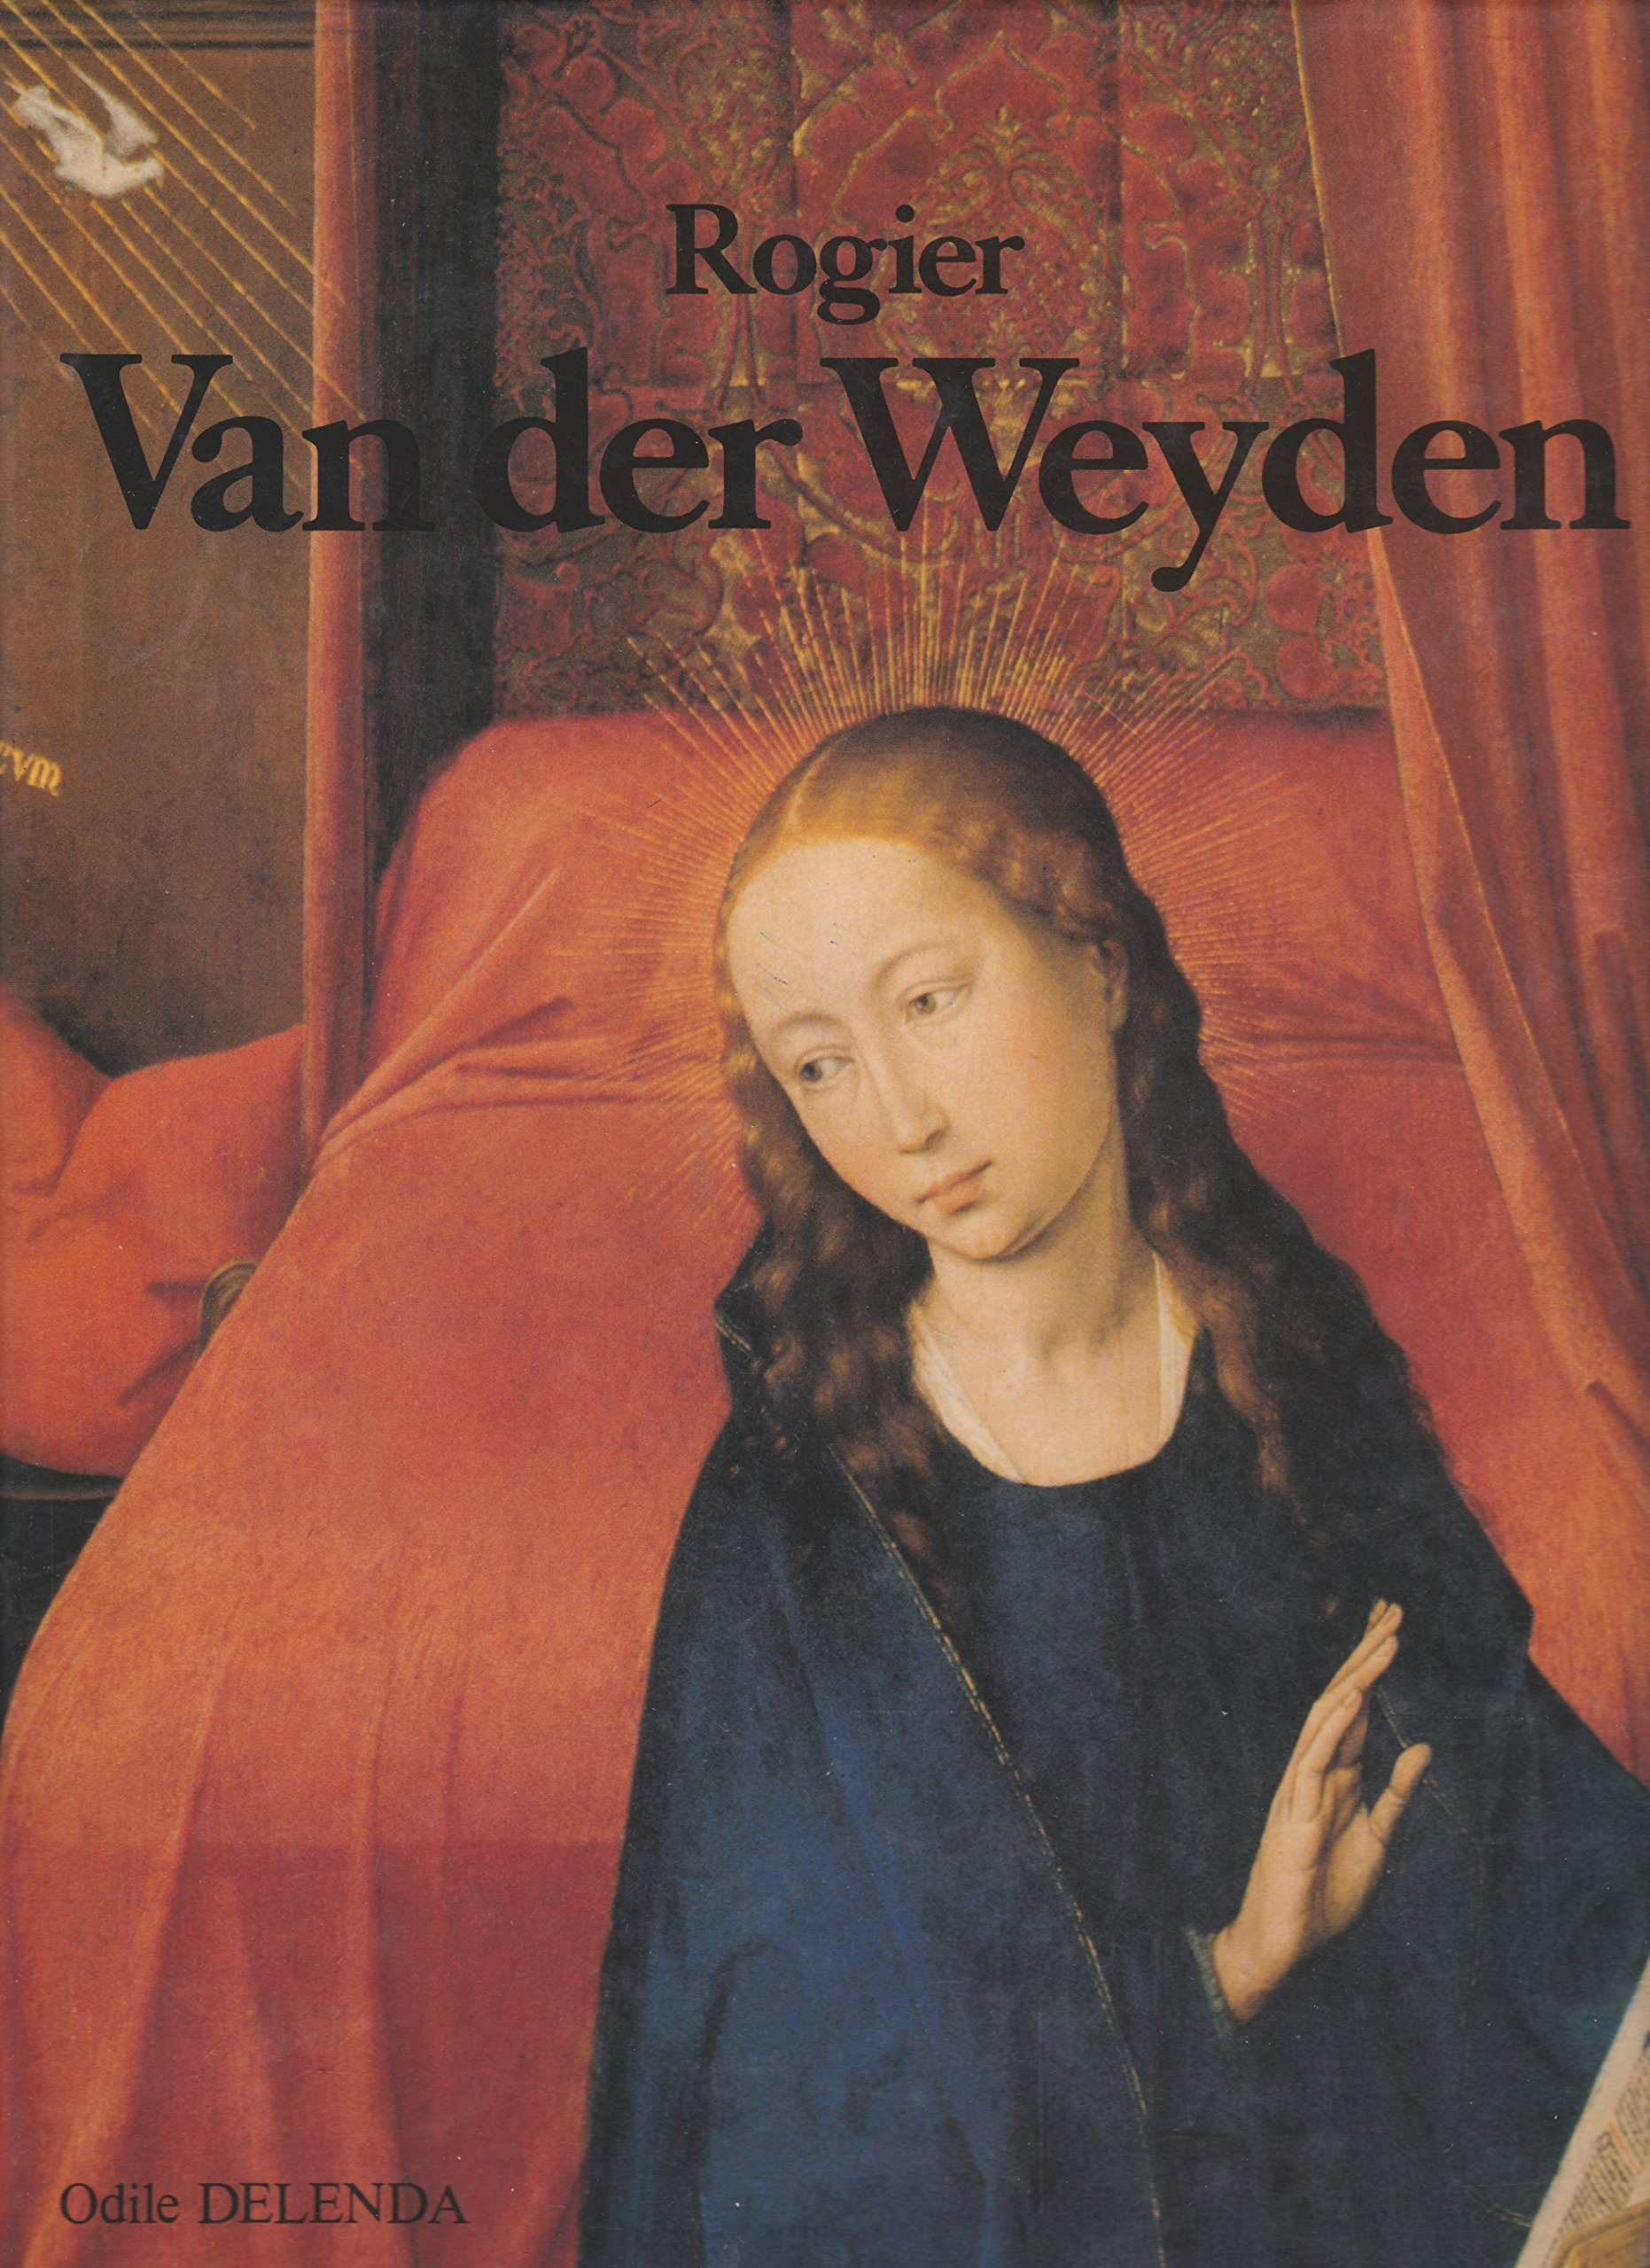 Rogier Van der Weyden Broché – 1 septembre 2005 DELENDA ODILE Editions du Tricorne 2204025372 Art